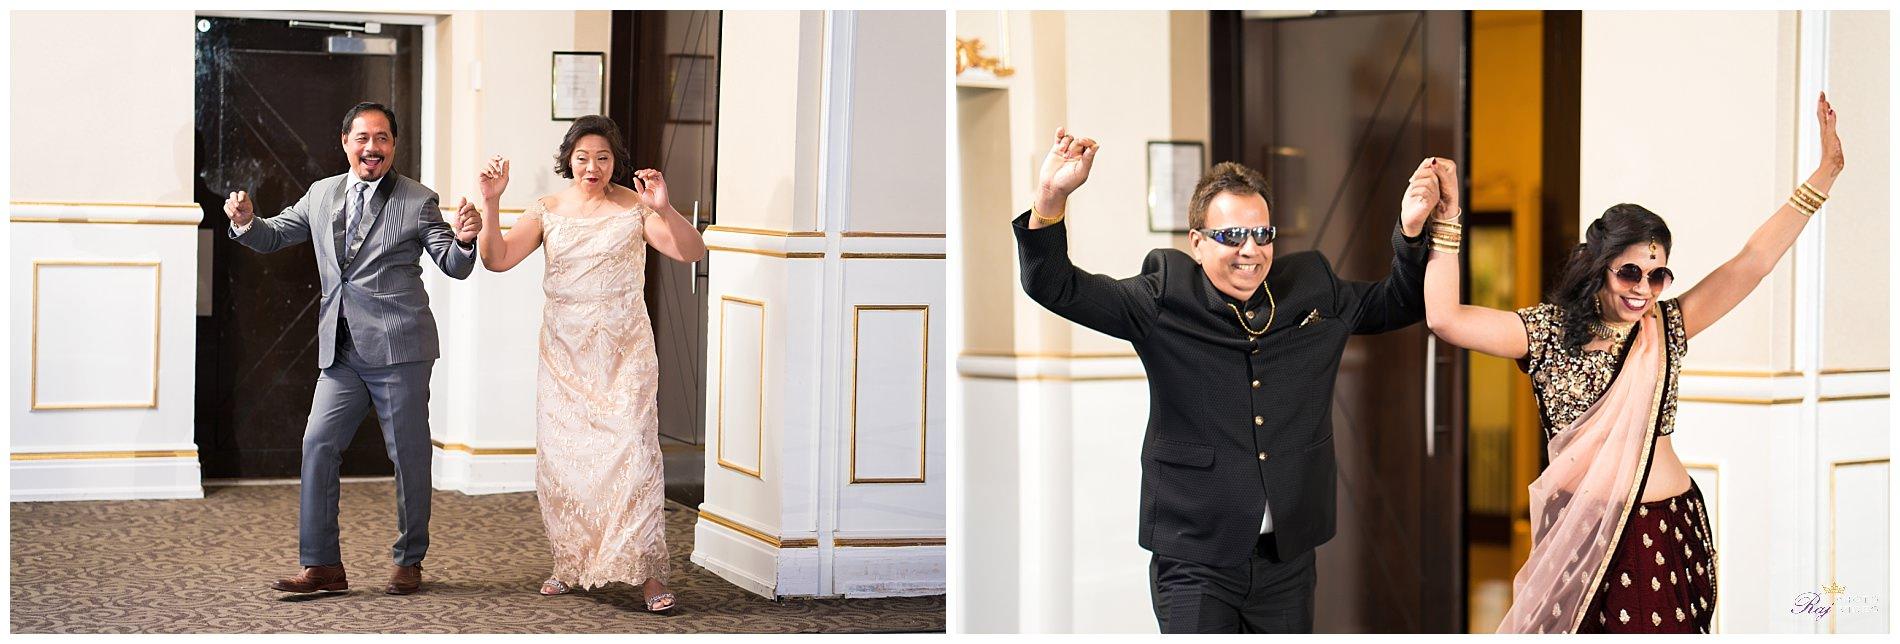 Royal-Manor-Garfield-NJ-Christian-Wedding-Ceremony-Khusbu-Jeff-61.jpg